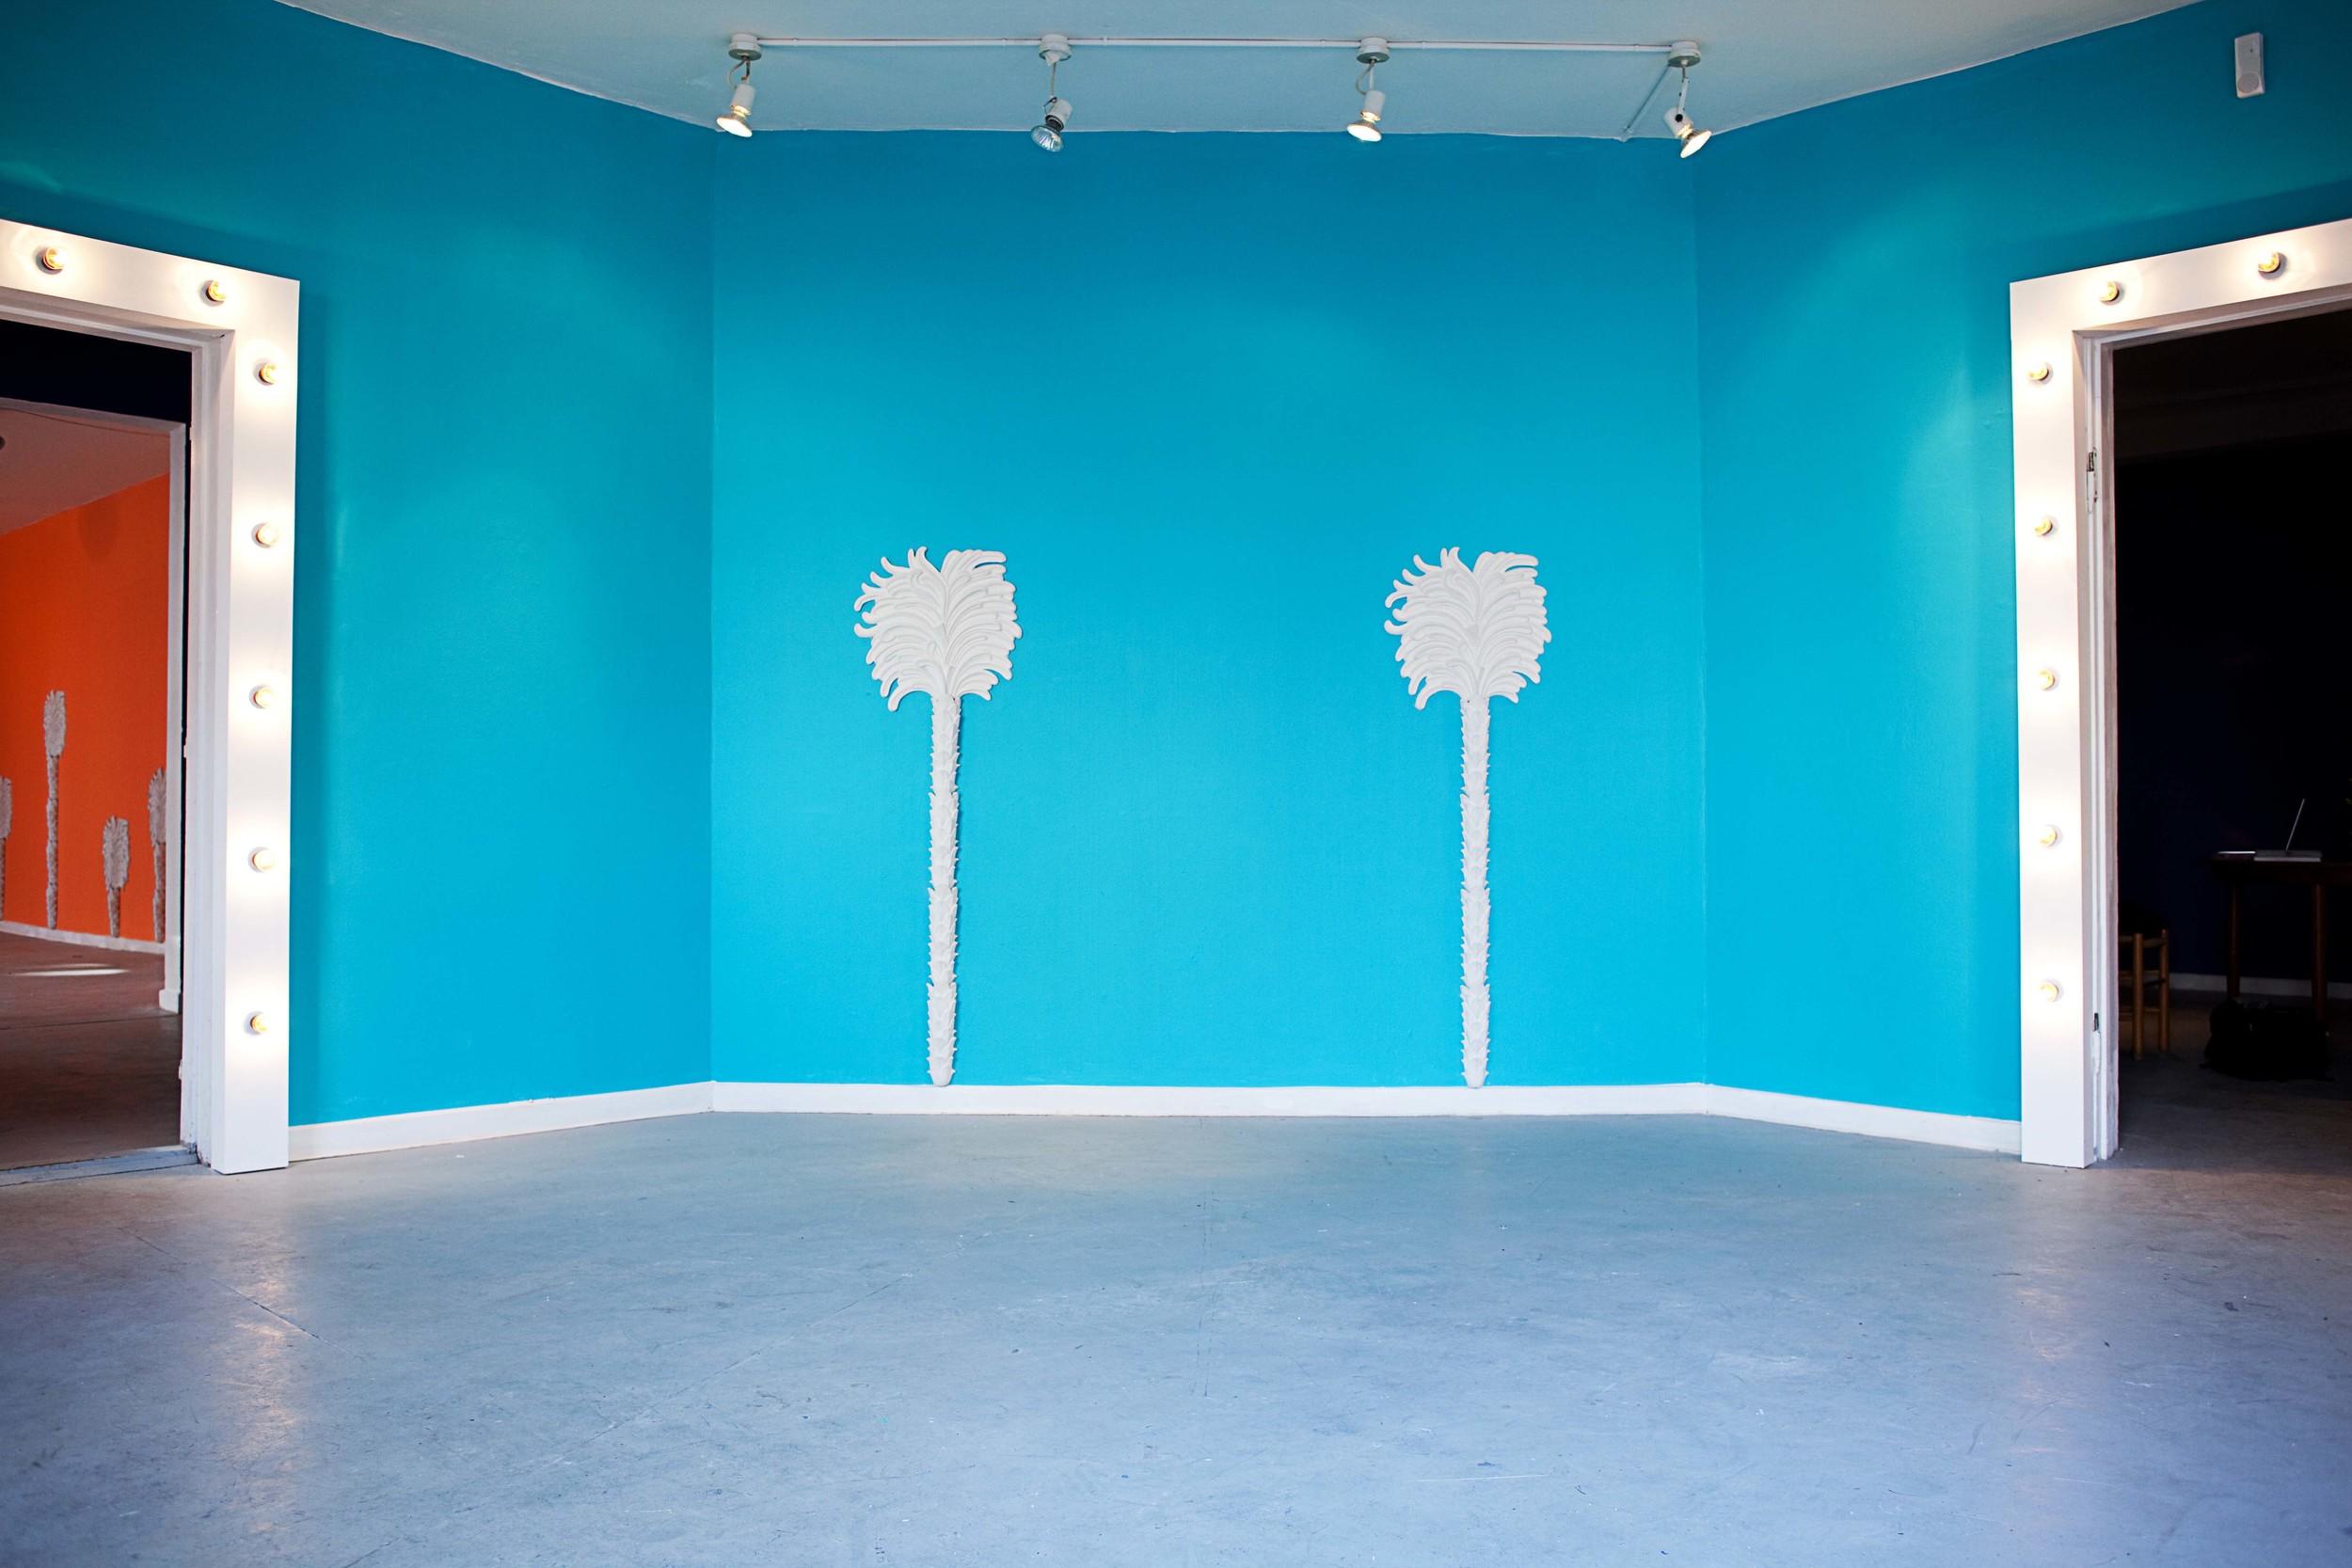 Installation view from Mathias & Mathias, 'Fine and Dandy', Q, Copenhagen, 2012